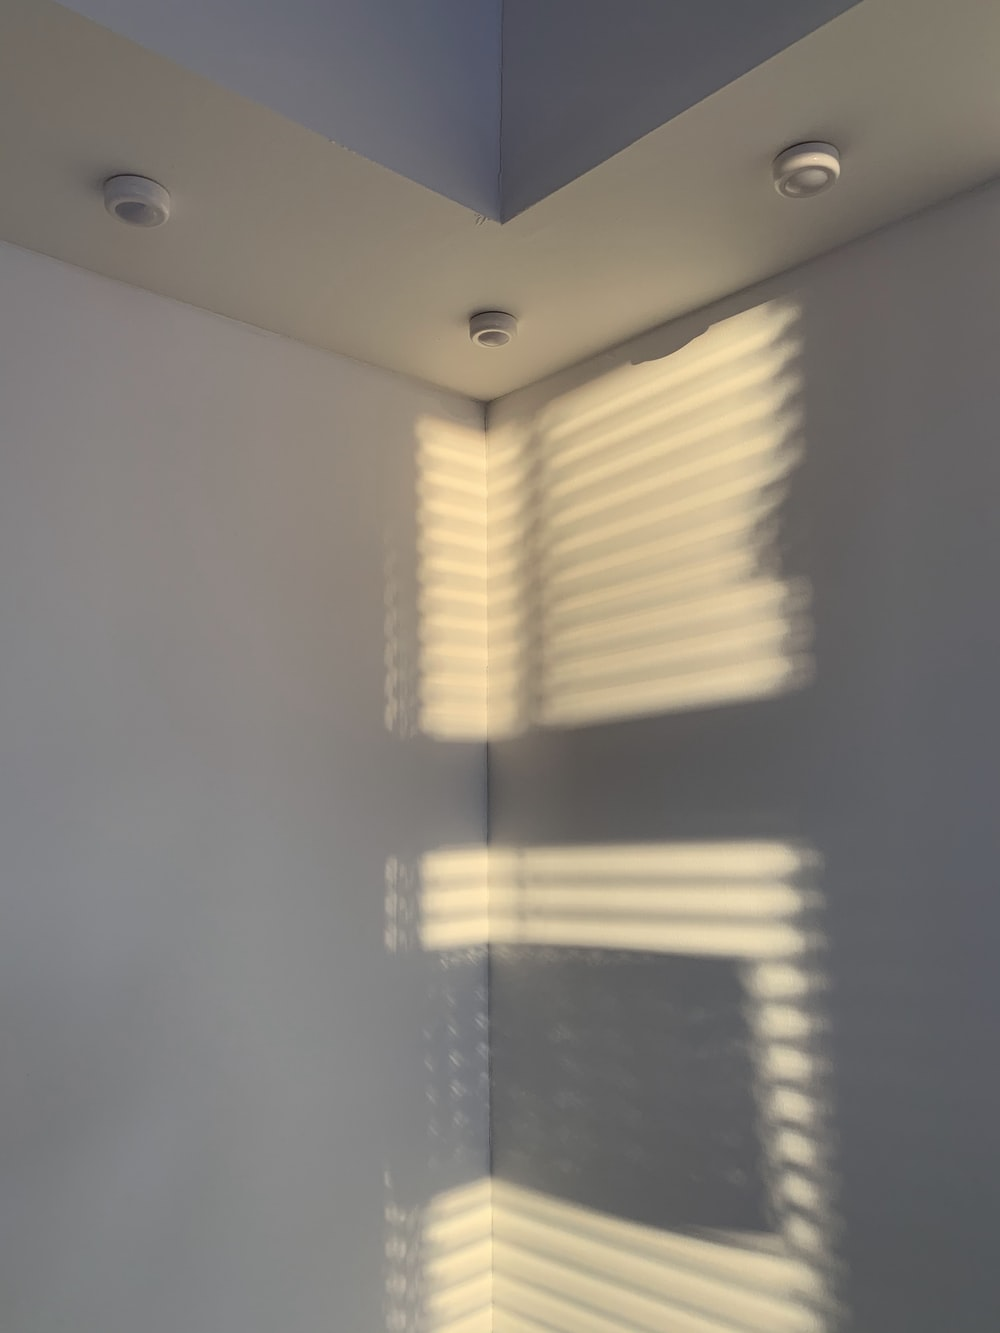 white window curtain on white wall